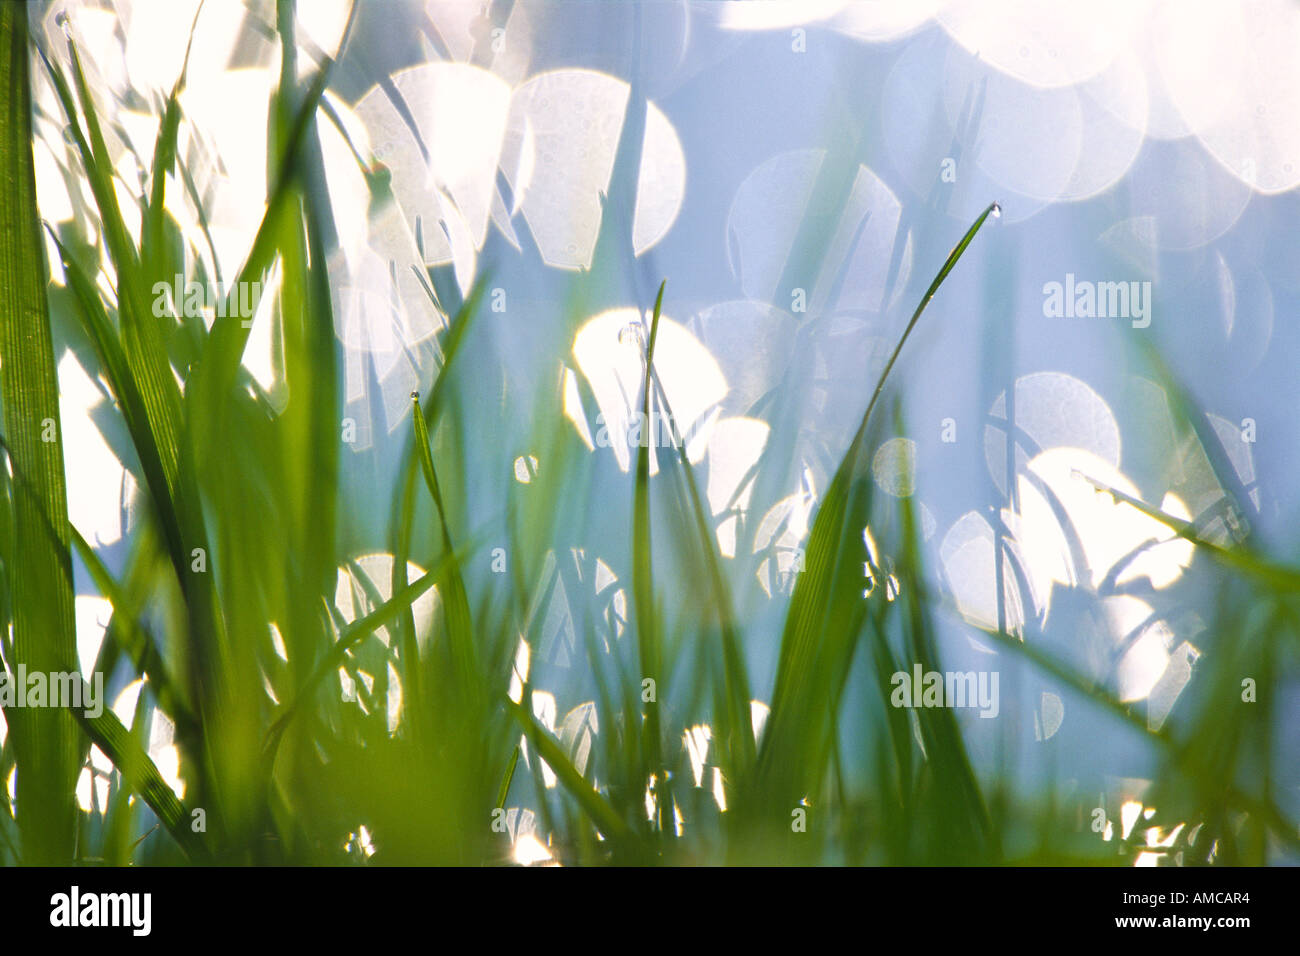 Grass Banque D'Images